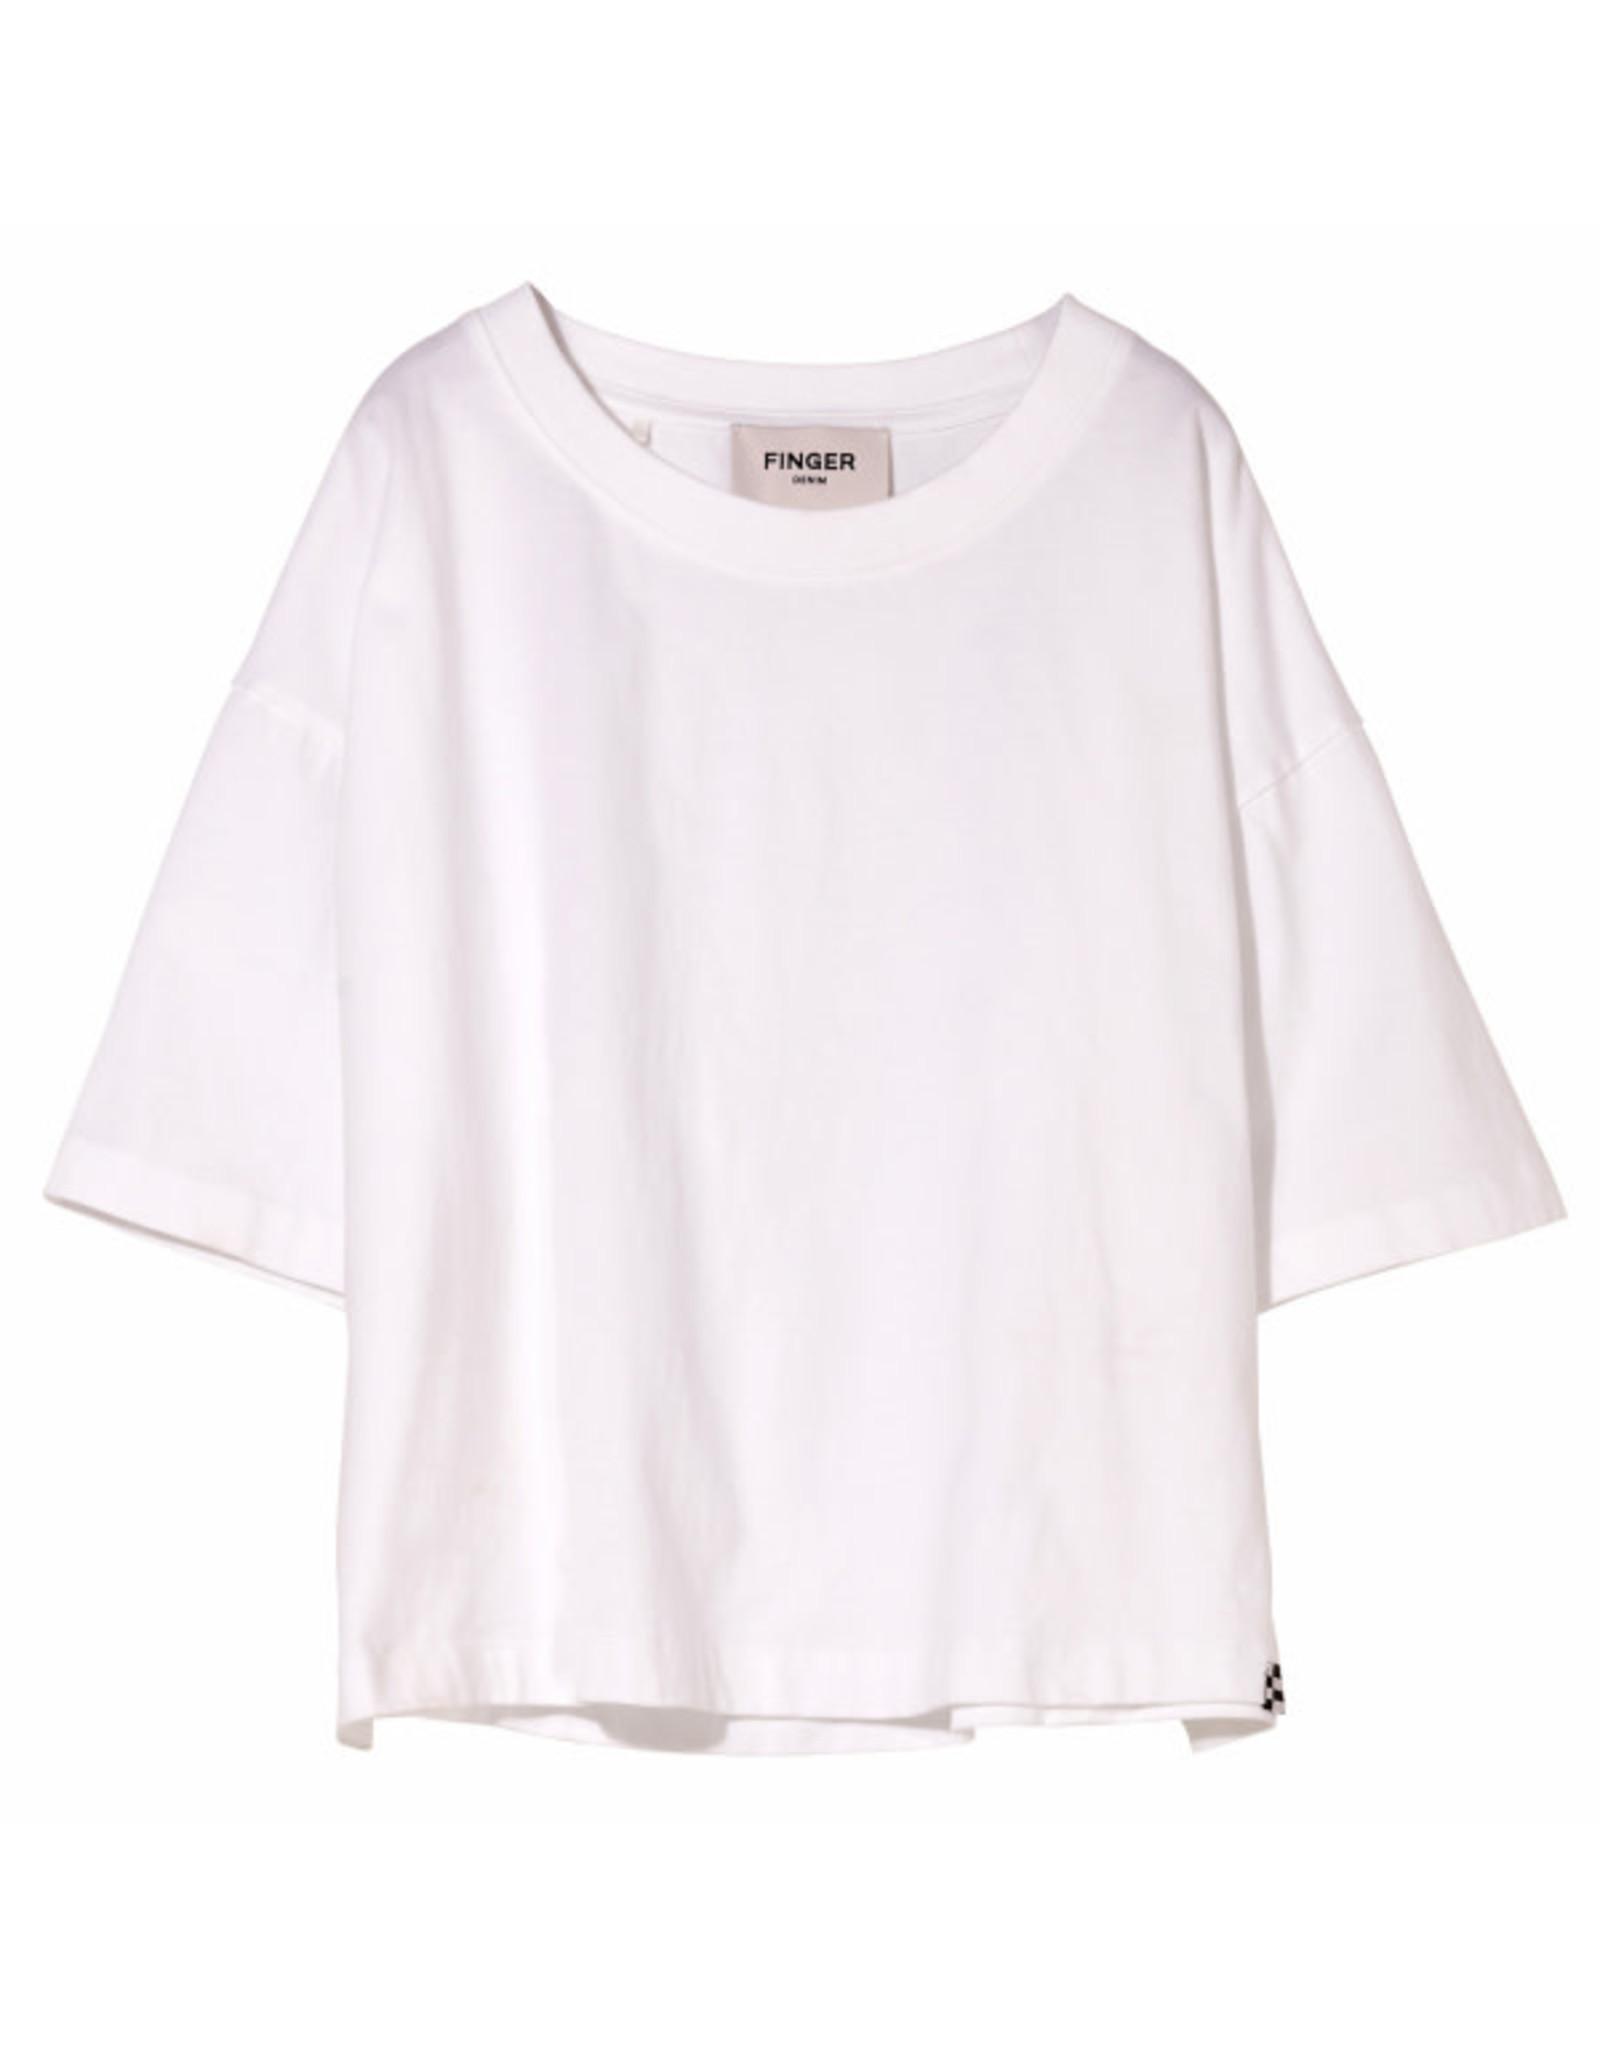 FITN SS21 SC002 cropped shirt